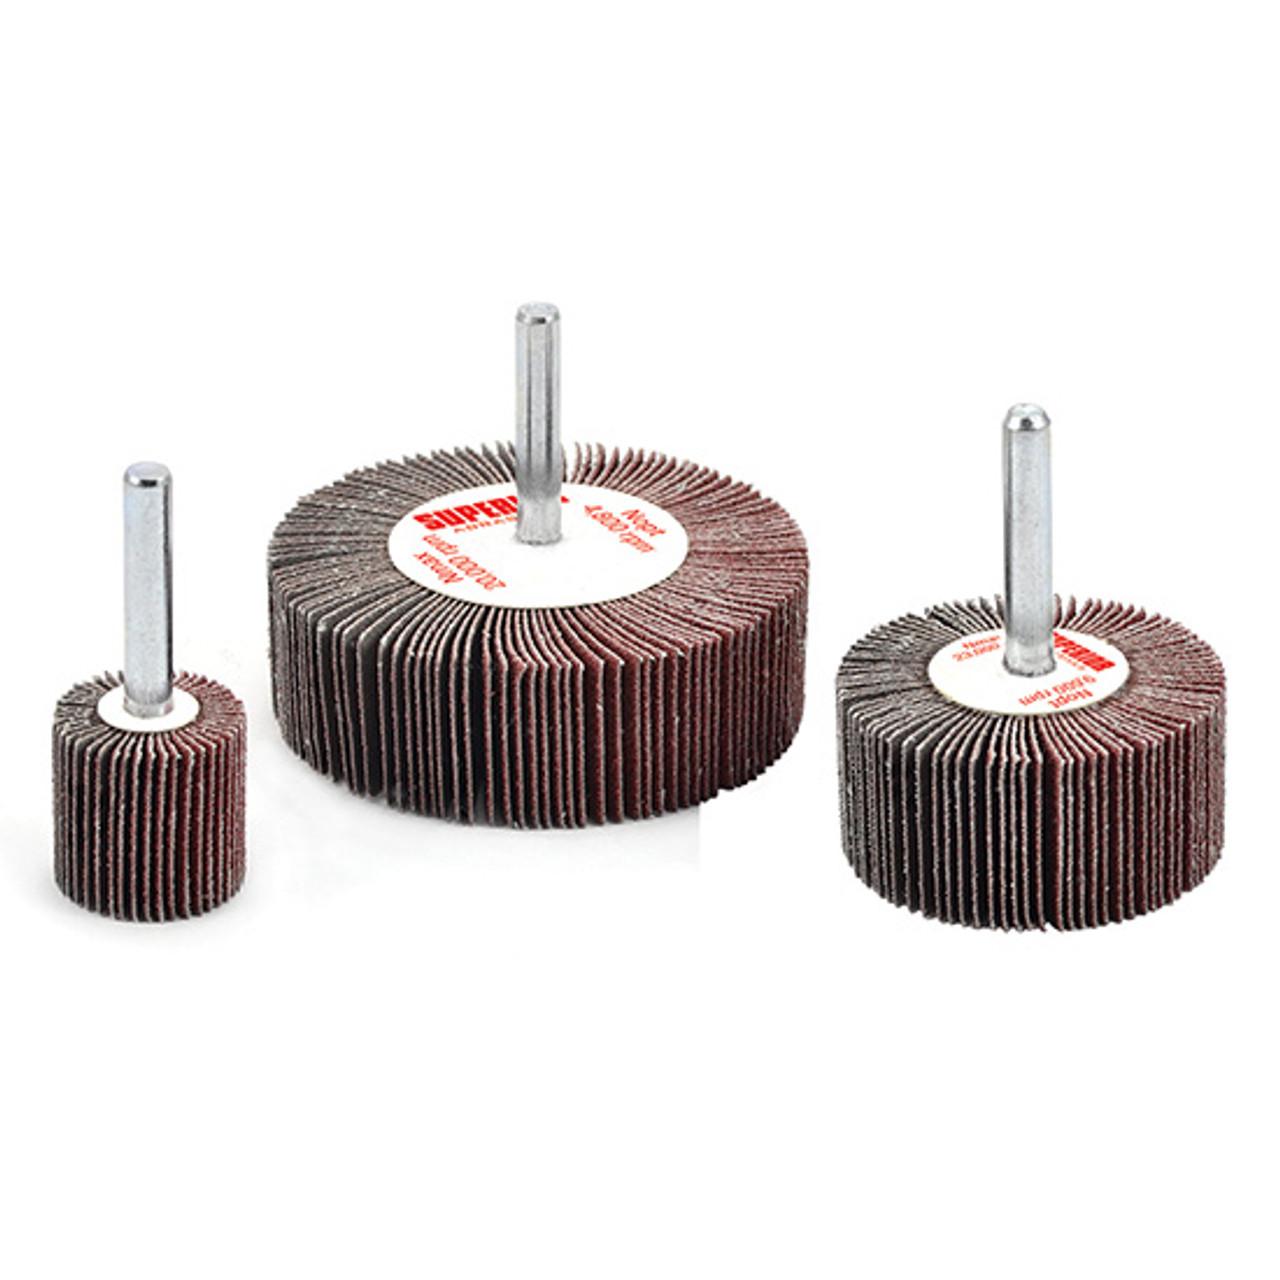 "80 Grit Aluminum Oxide Mounted Abrasiv 1/"" x 1/"" x 1//4/"" Shank Mounted Flap Wheels"